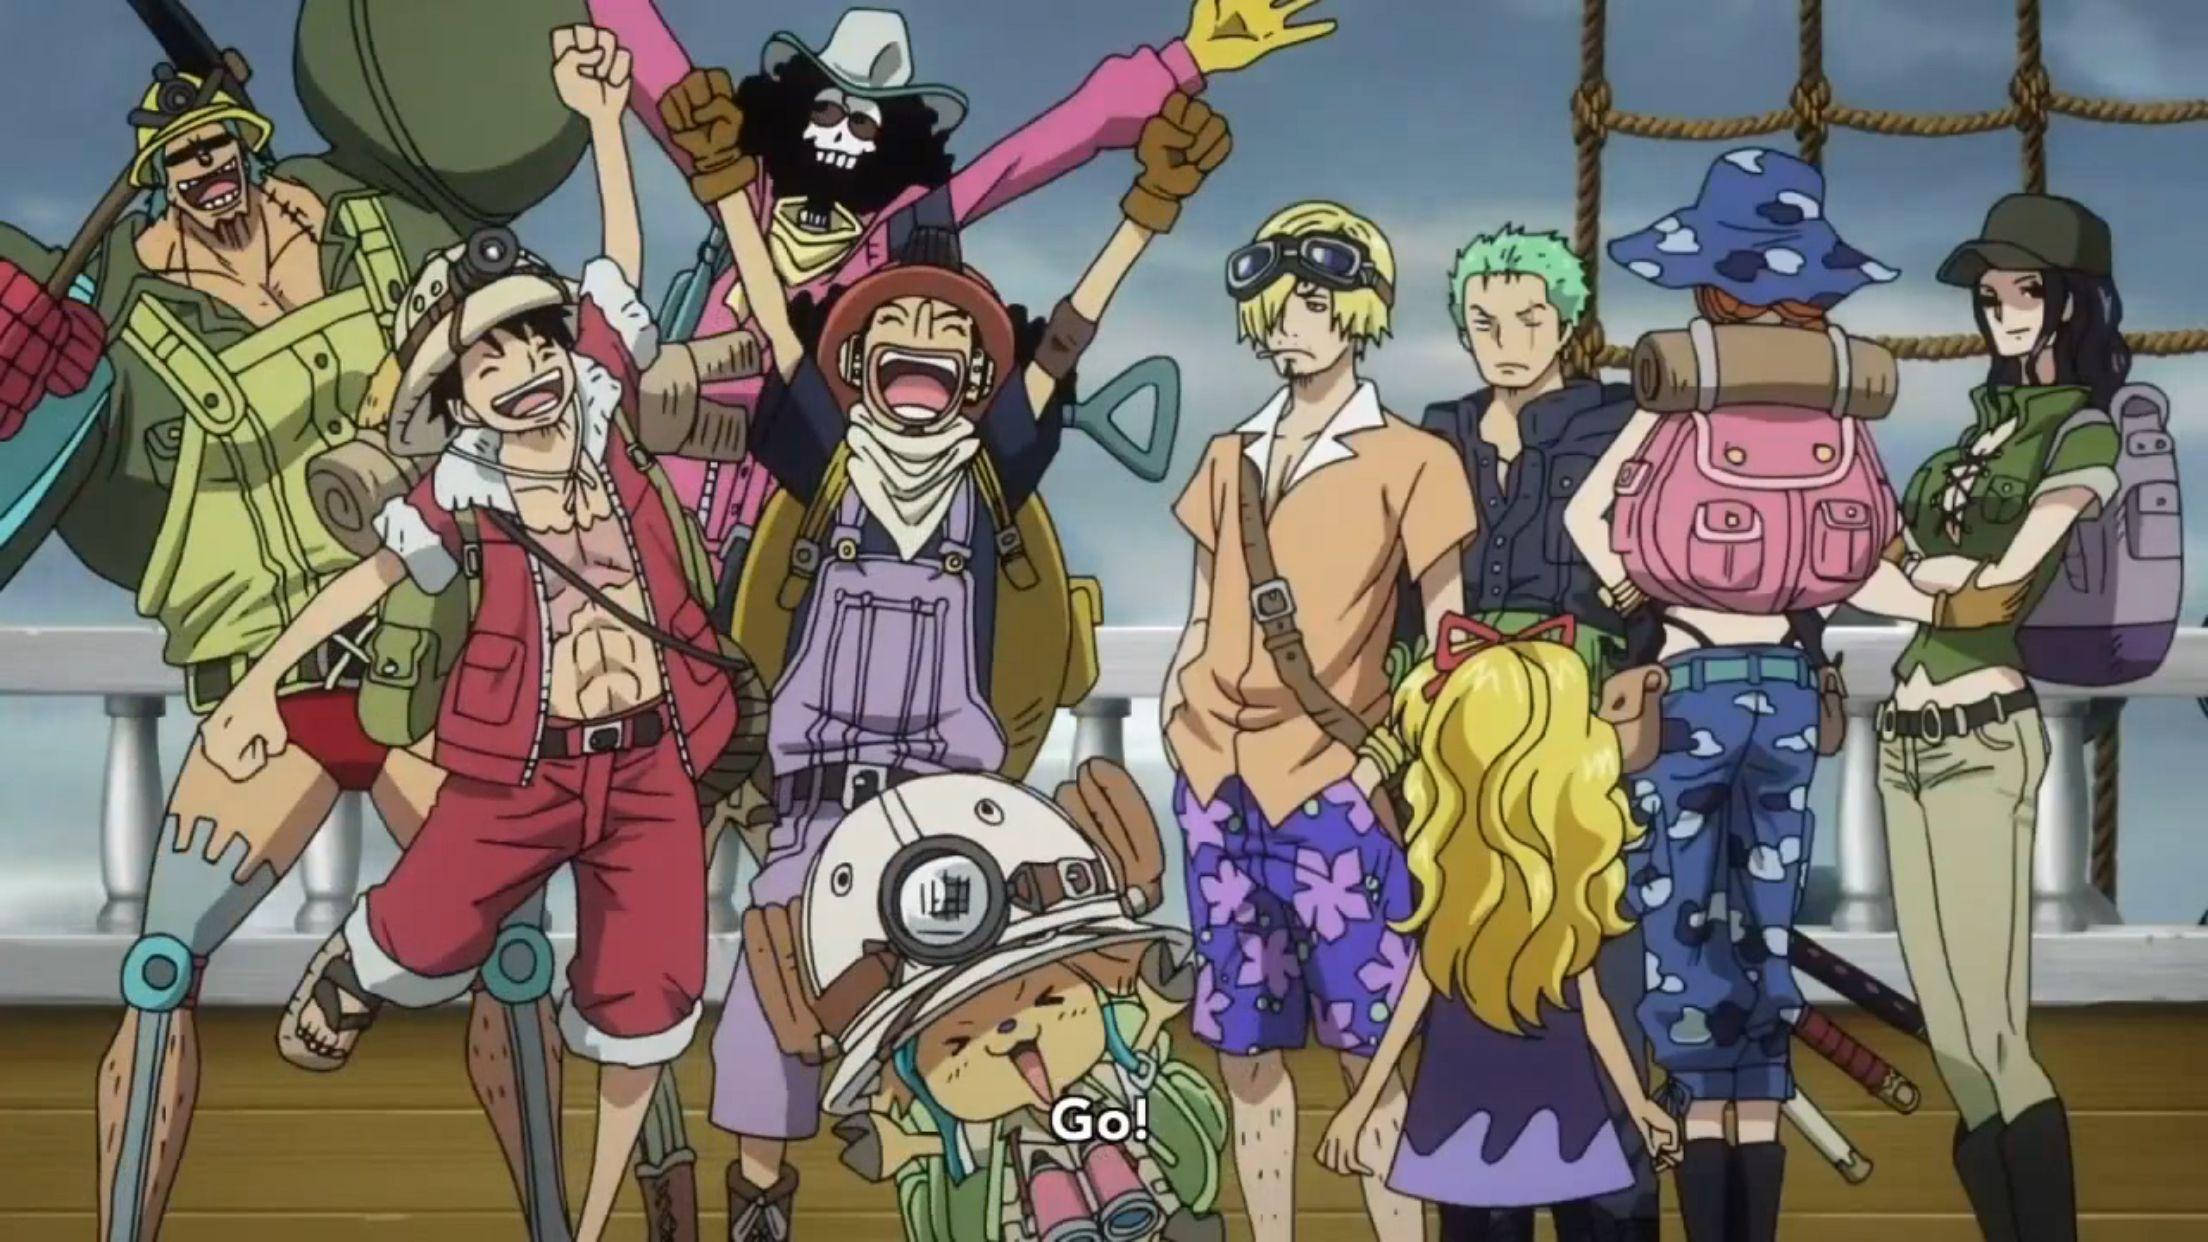 Mugiwaras One Piece Piece Imagenes De One Piece